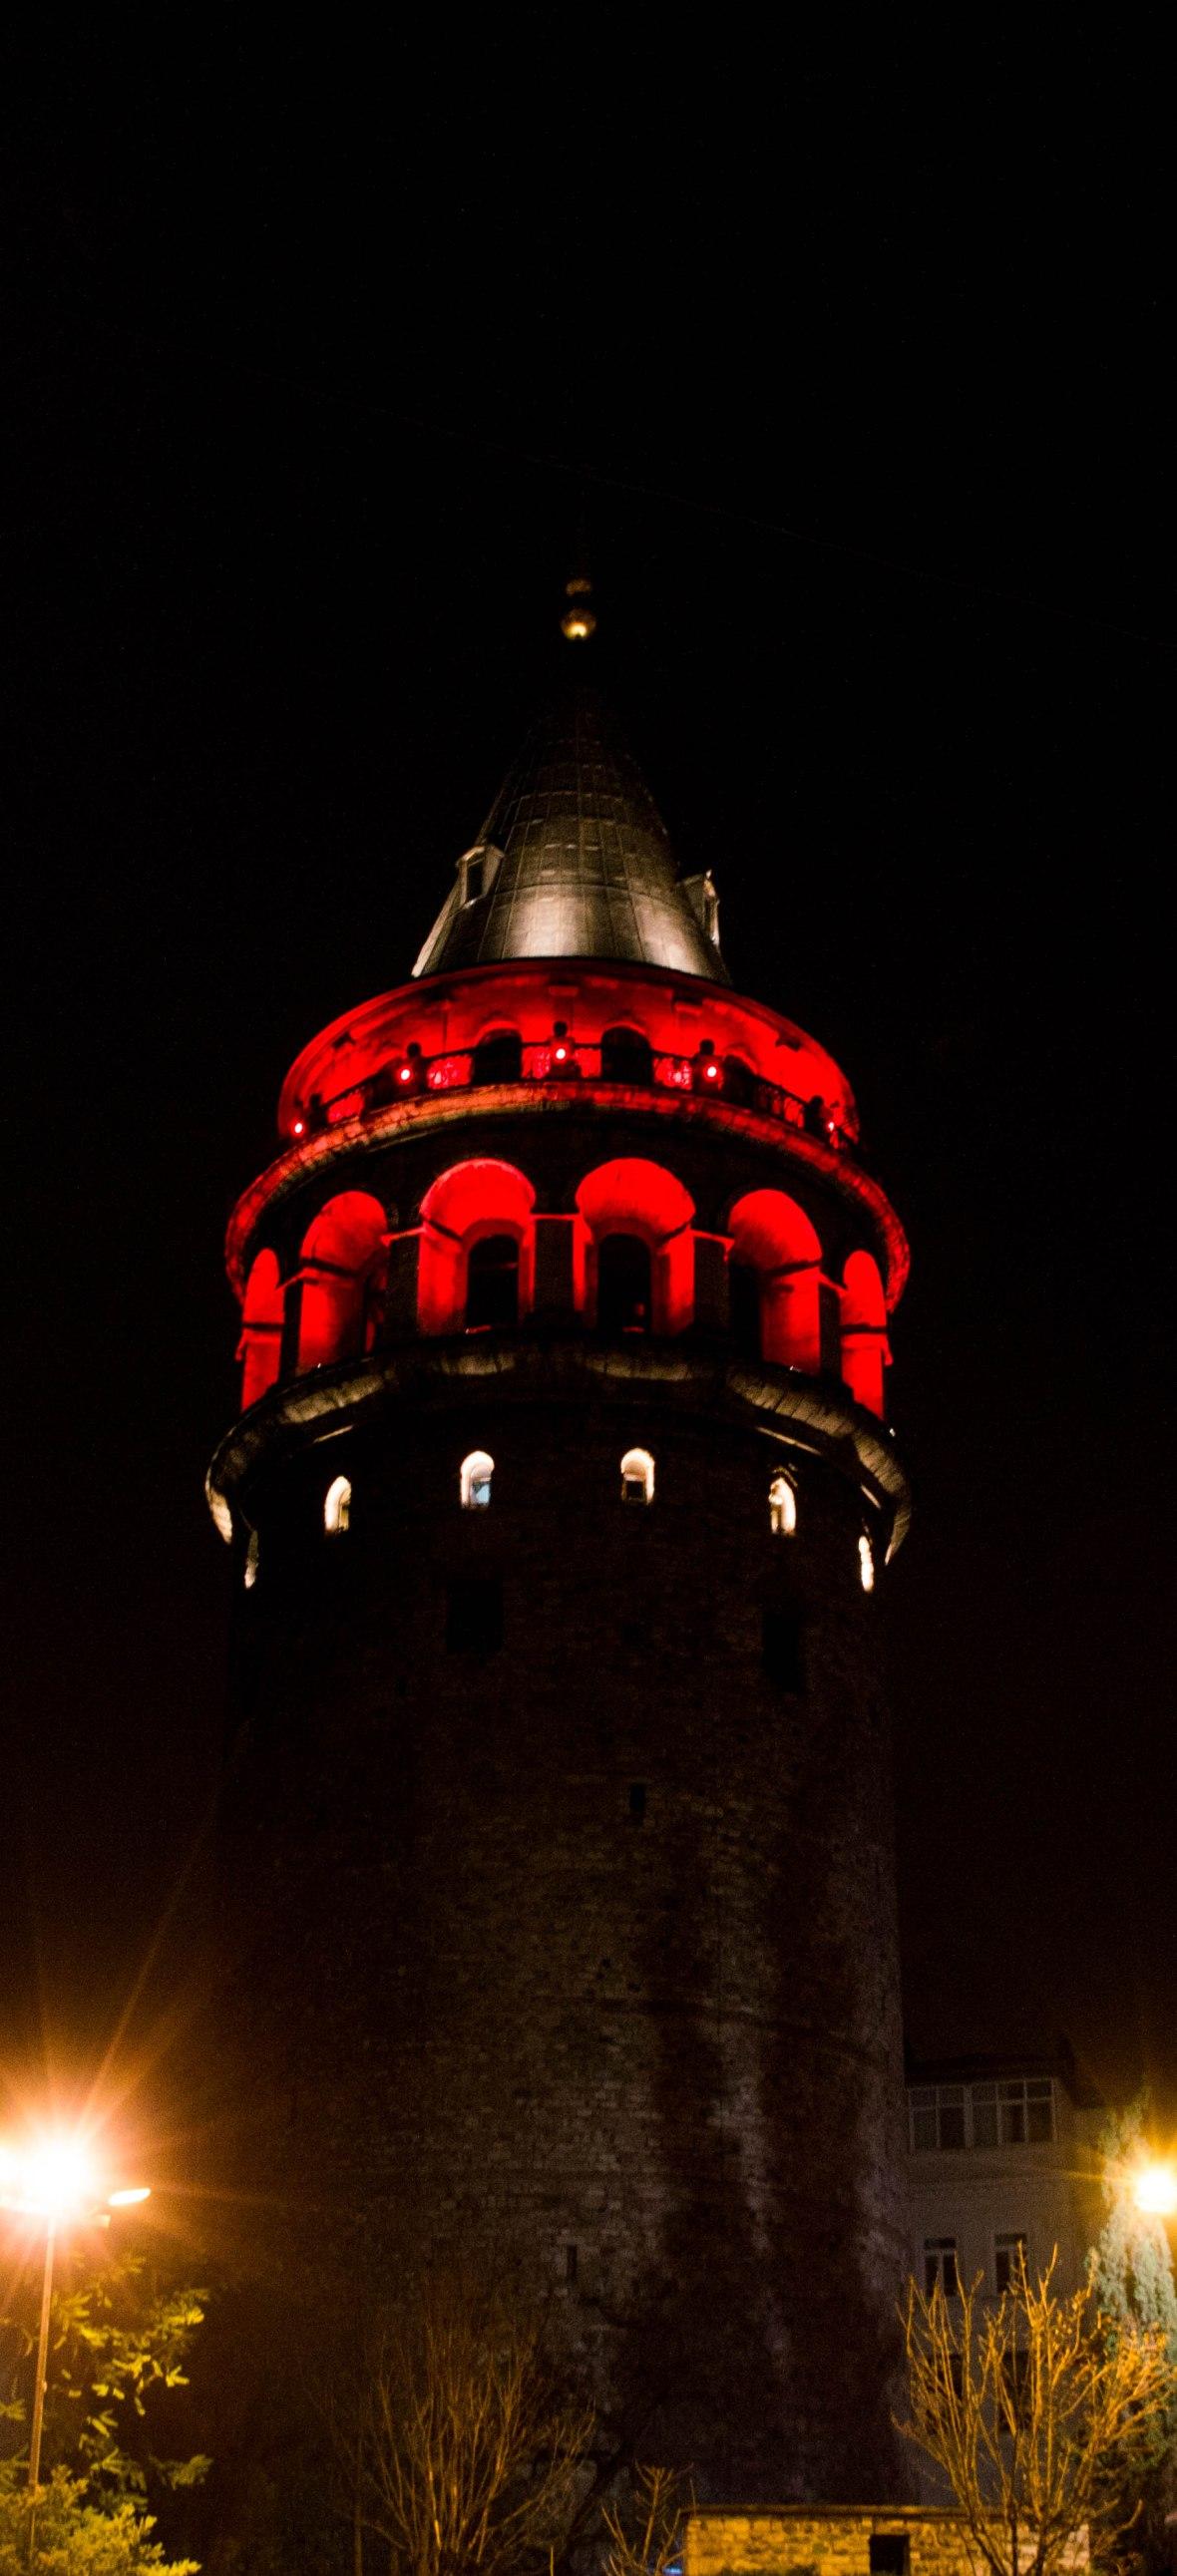 galata-tower-by-night-istanbul-turkey